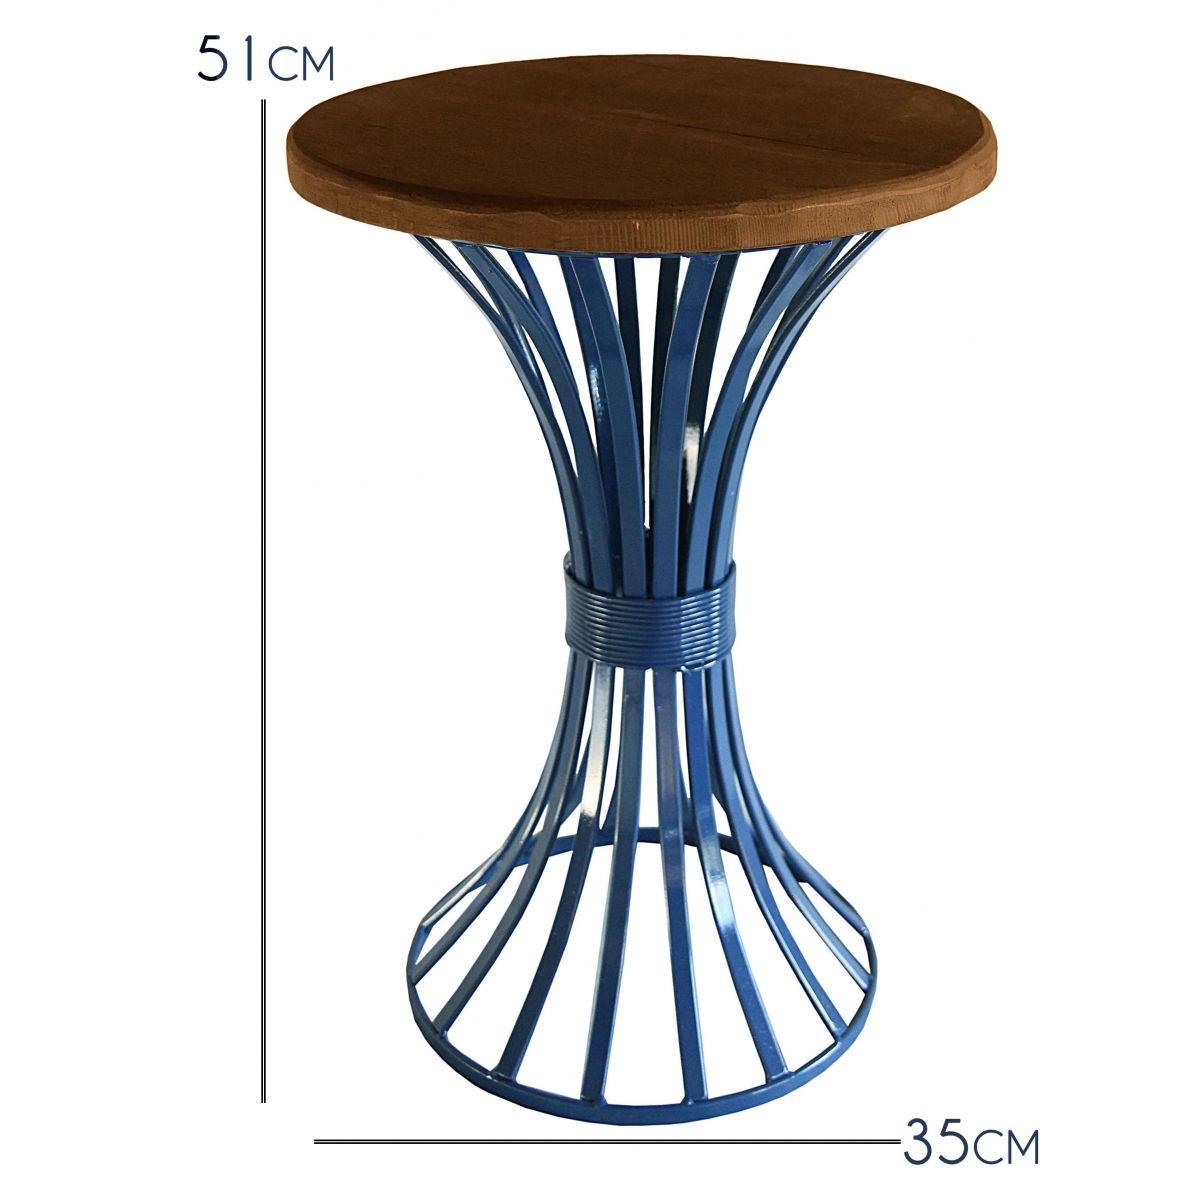 Mesa Lateral de Canto para Sala de Jantar Artesanal Rustica Decorativa de Ferro